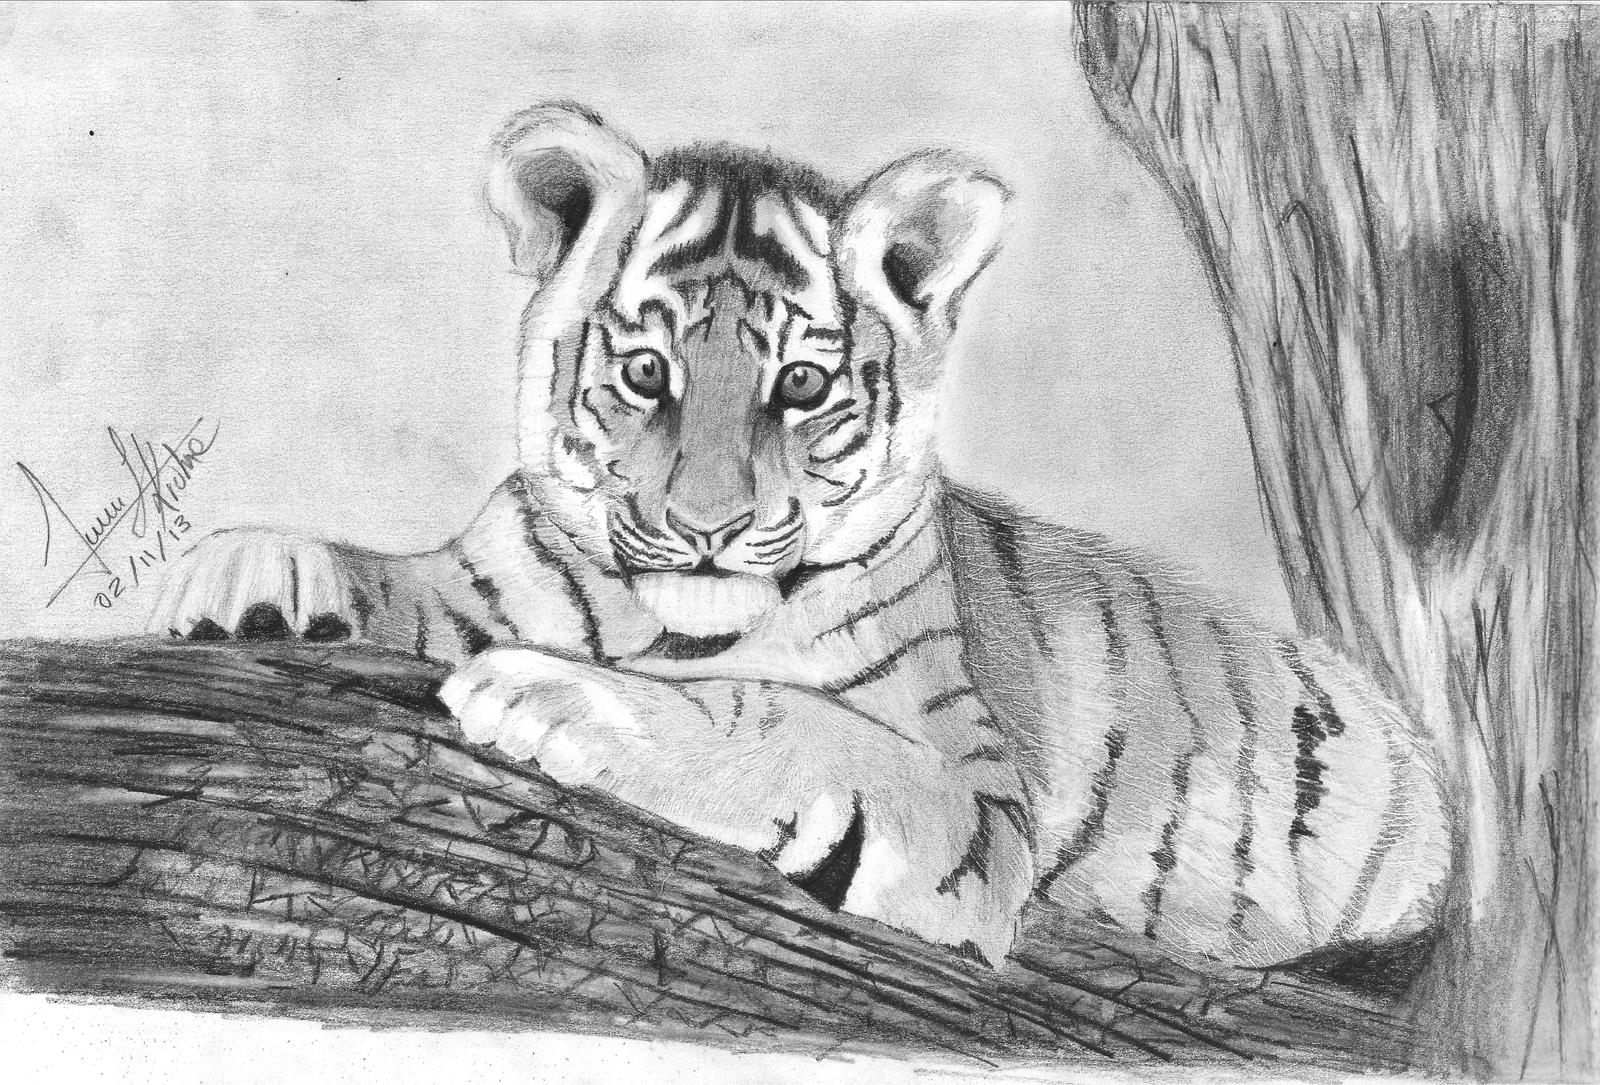 Tigre Sketch: Baby Tiger Draw # 25 By Juansk On DeviantArt